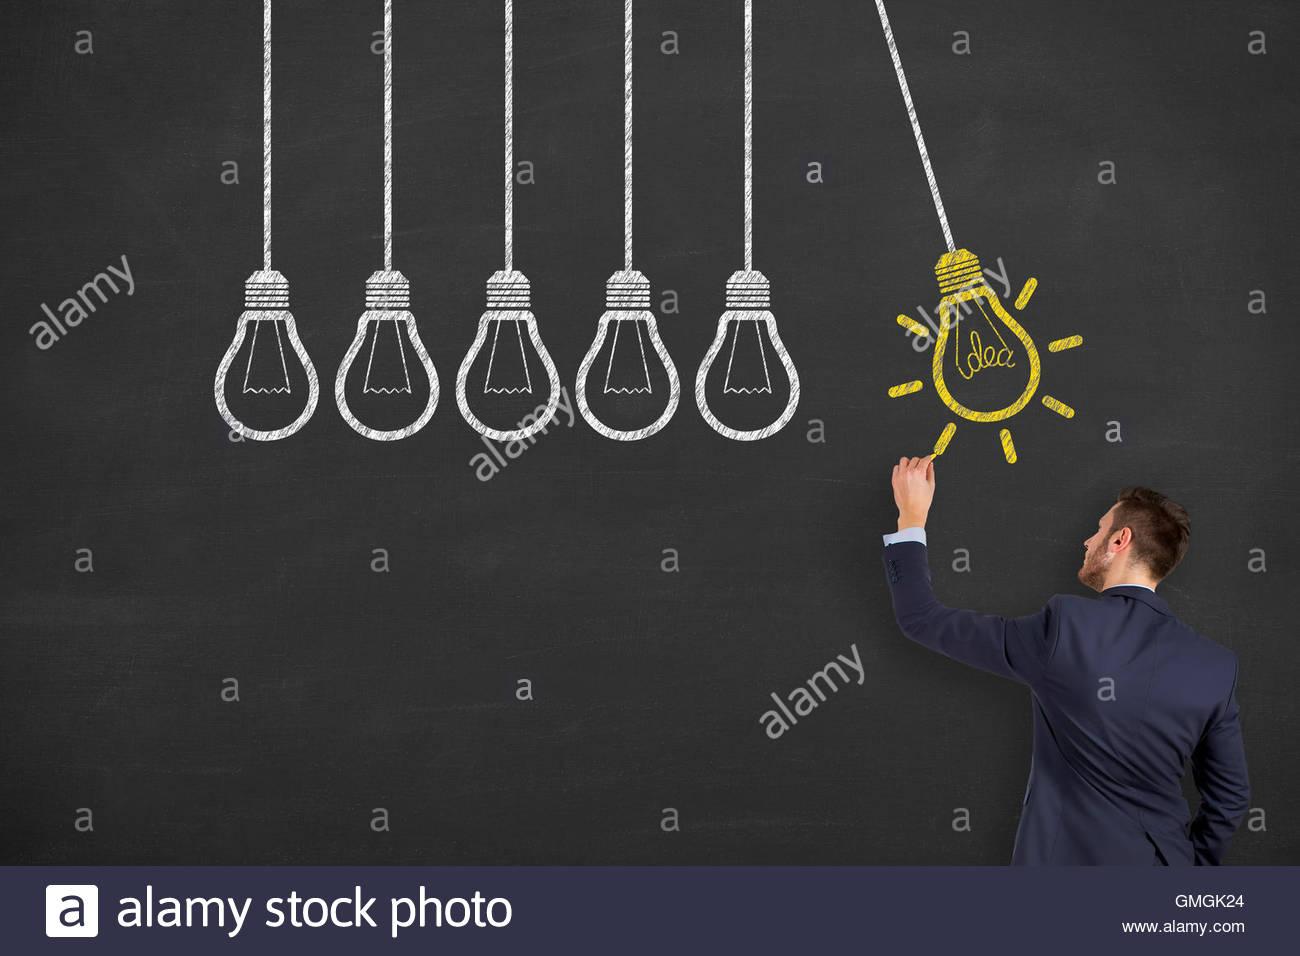 Idea Drawing Work on Blackboard idea, creativity, innovation, big data, thinking, success, leadership, imagination, - Stock Image